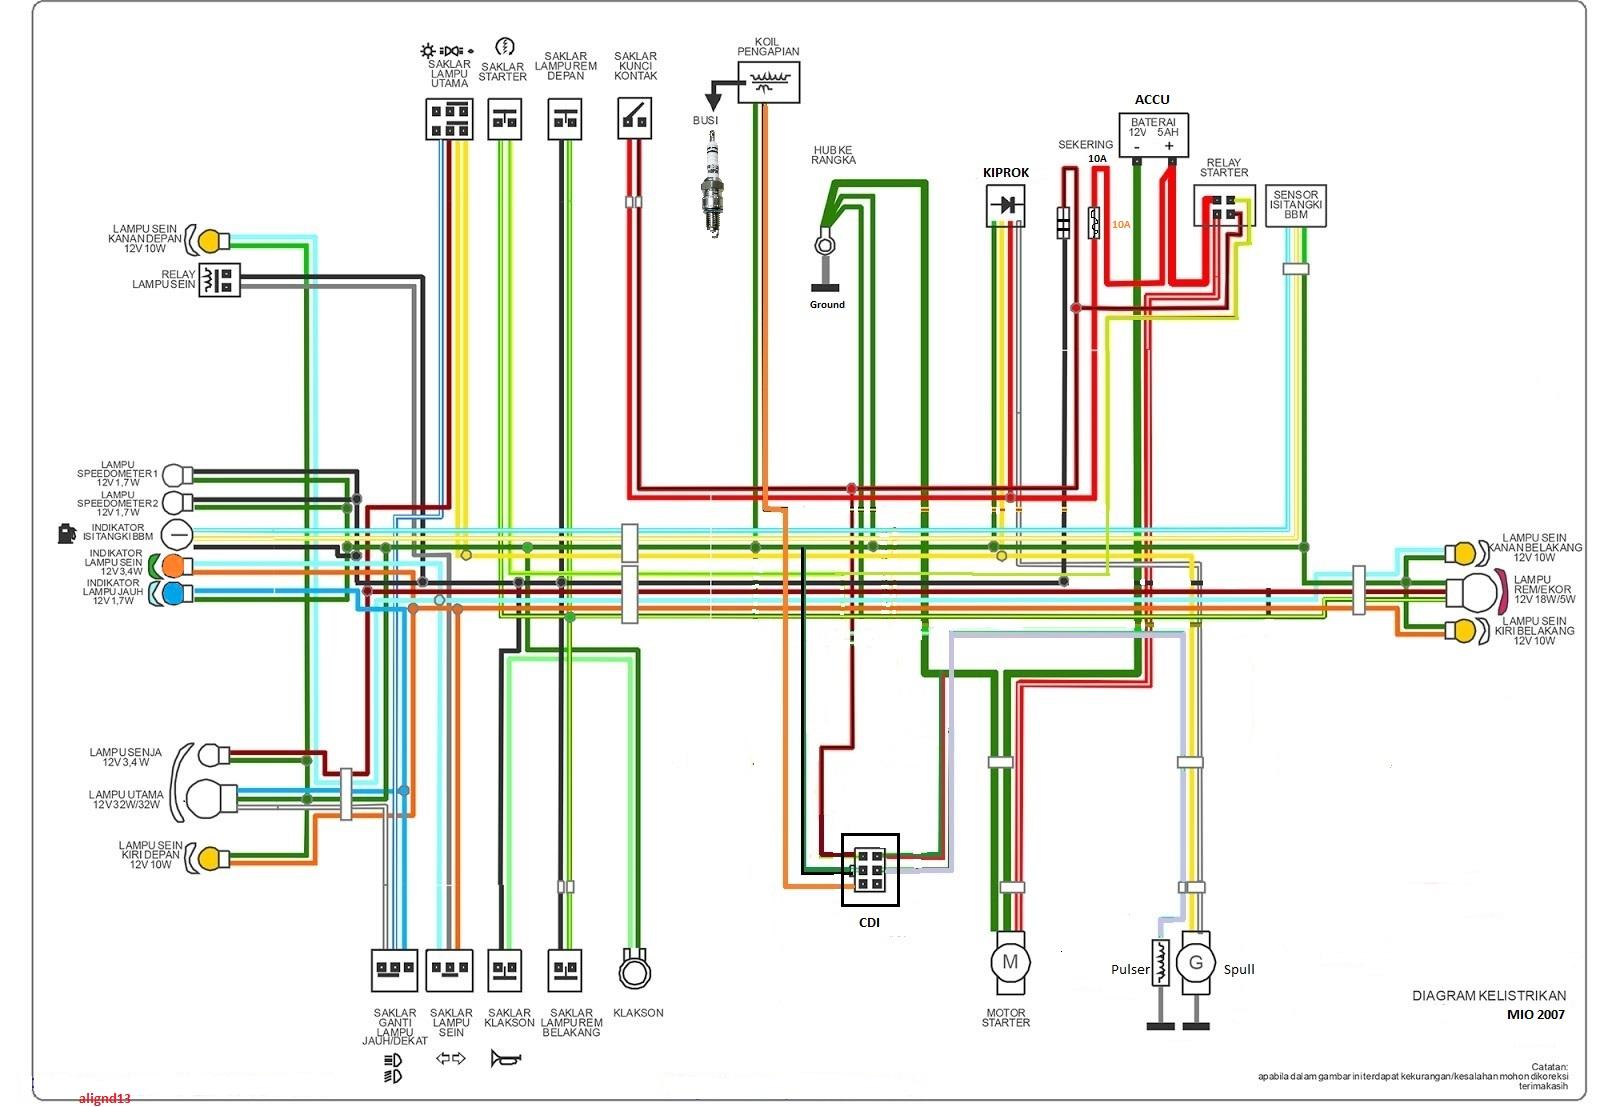 medium resolution of diagram kelistrikan mio